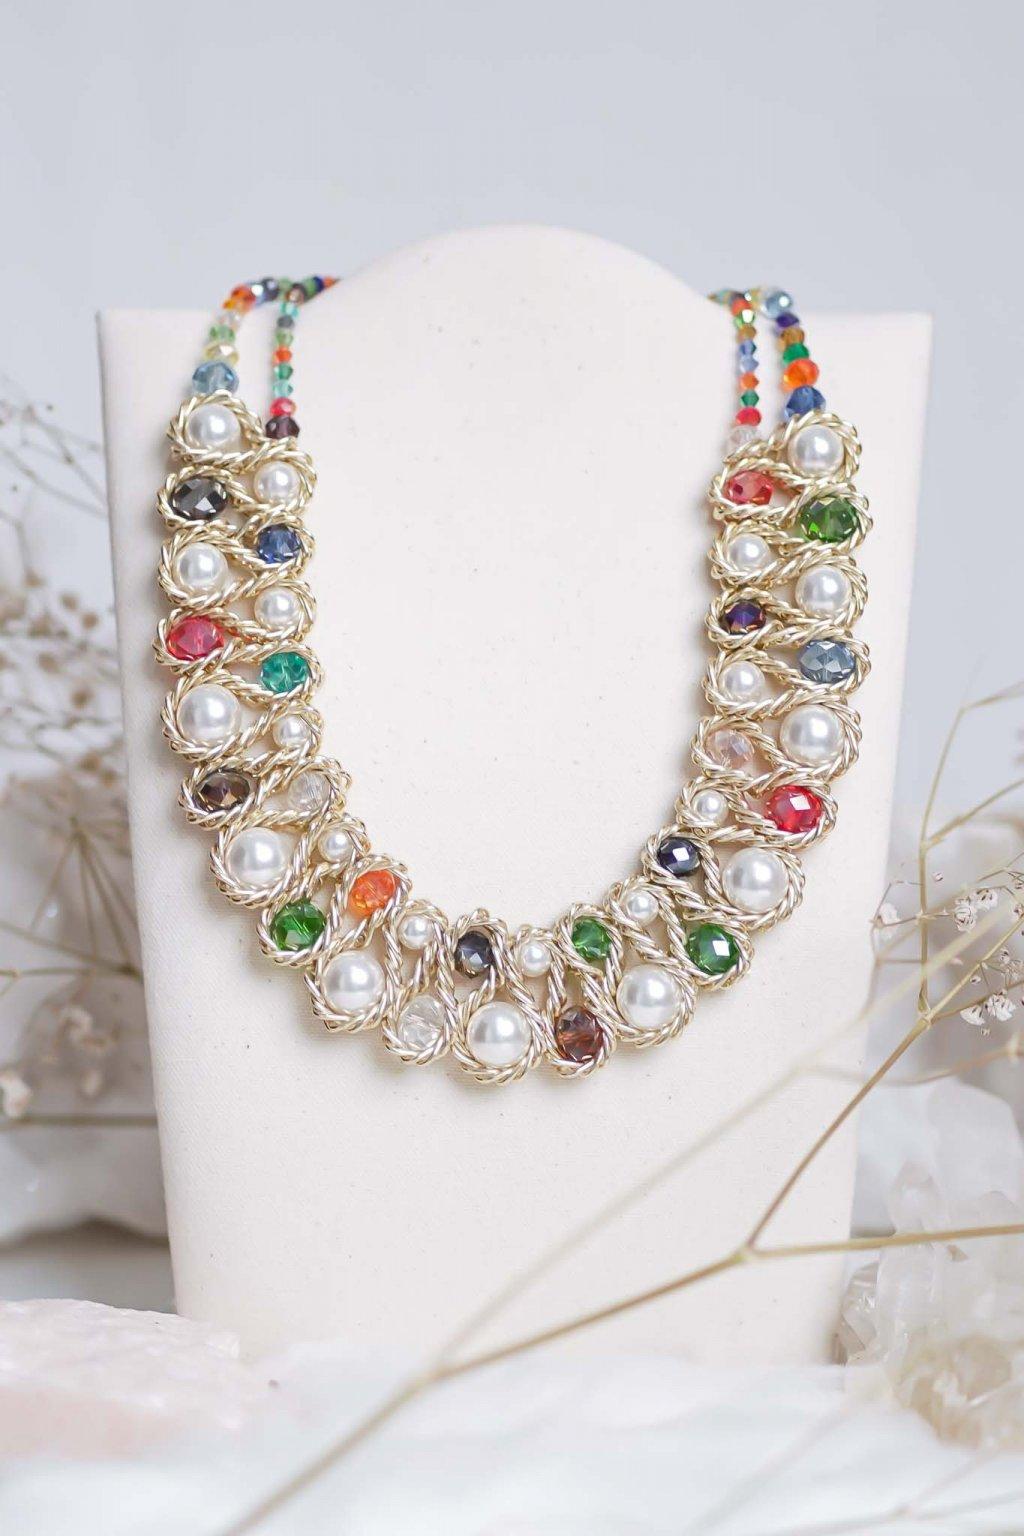 náhrdelník, šperk, spoločenská náhrdelník, náhrdelník na bežný deň, výrazný náhrdelník, jemný náhrdelník, šperky, náhrdelník na ples, svadbu, stužkovú 28